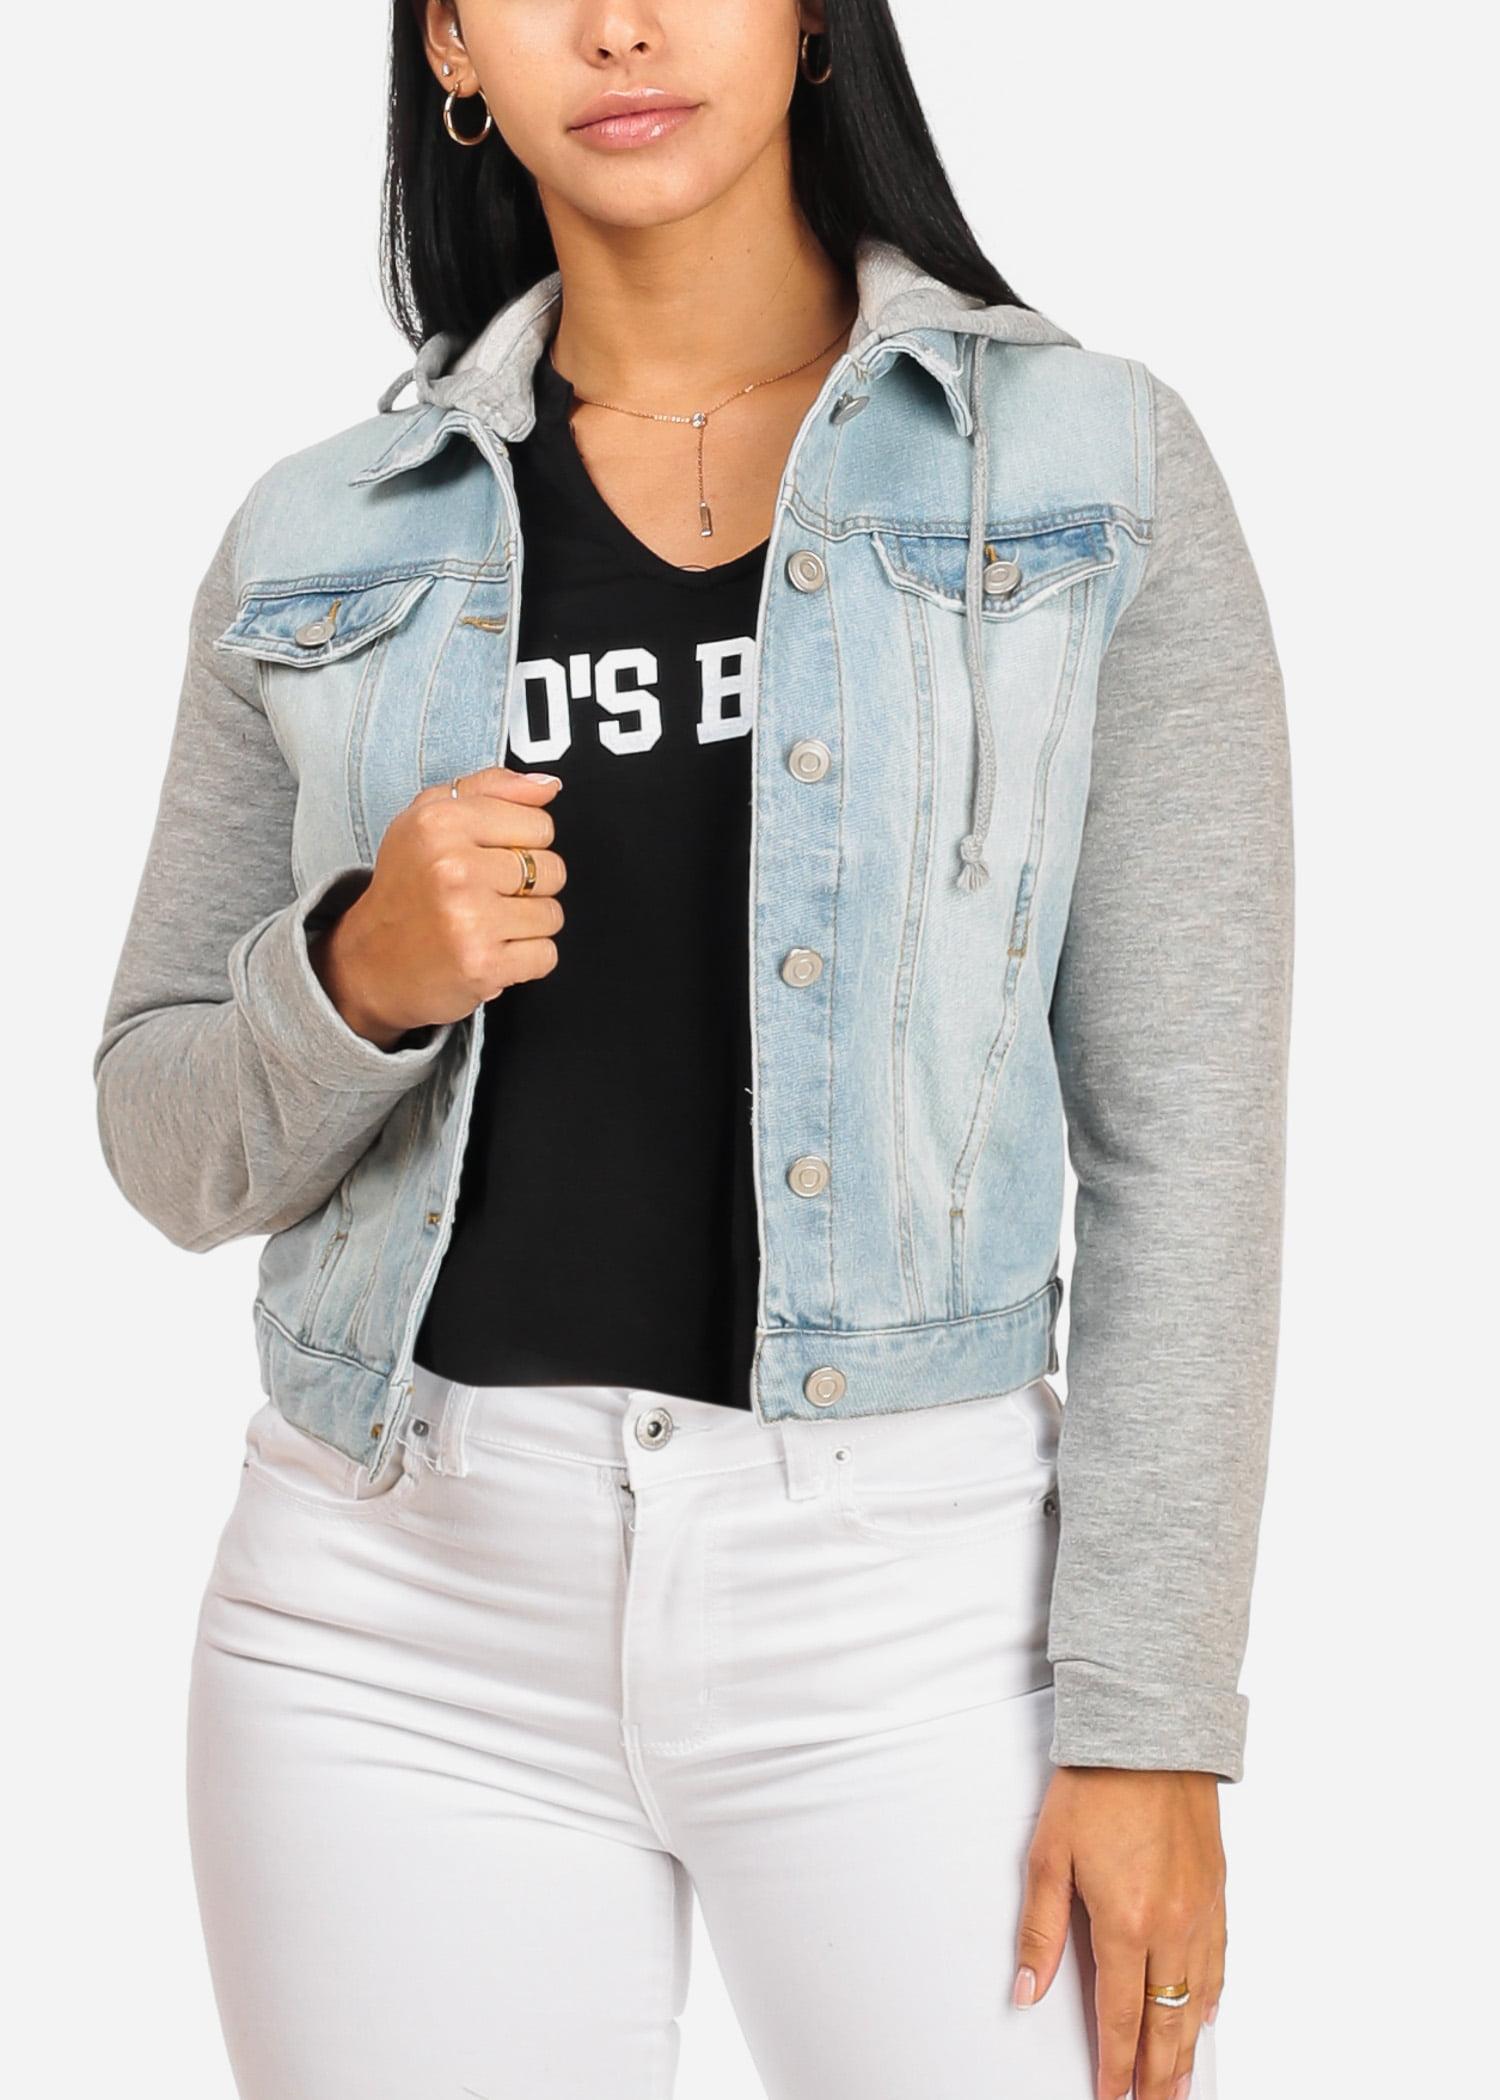 Womens Juniors Cute Drawstring Hood Long Sleeve Jersey Light Wash Denim Jacket 41319P